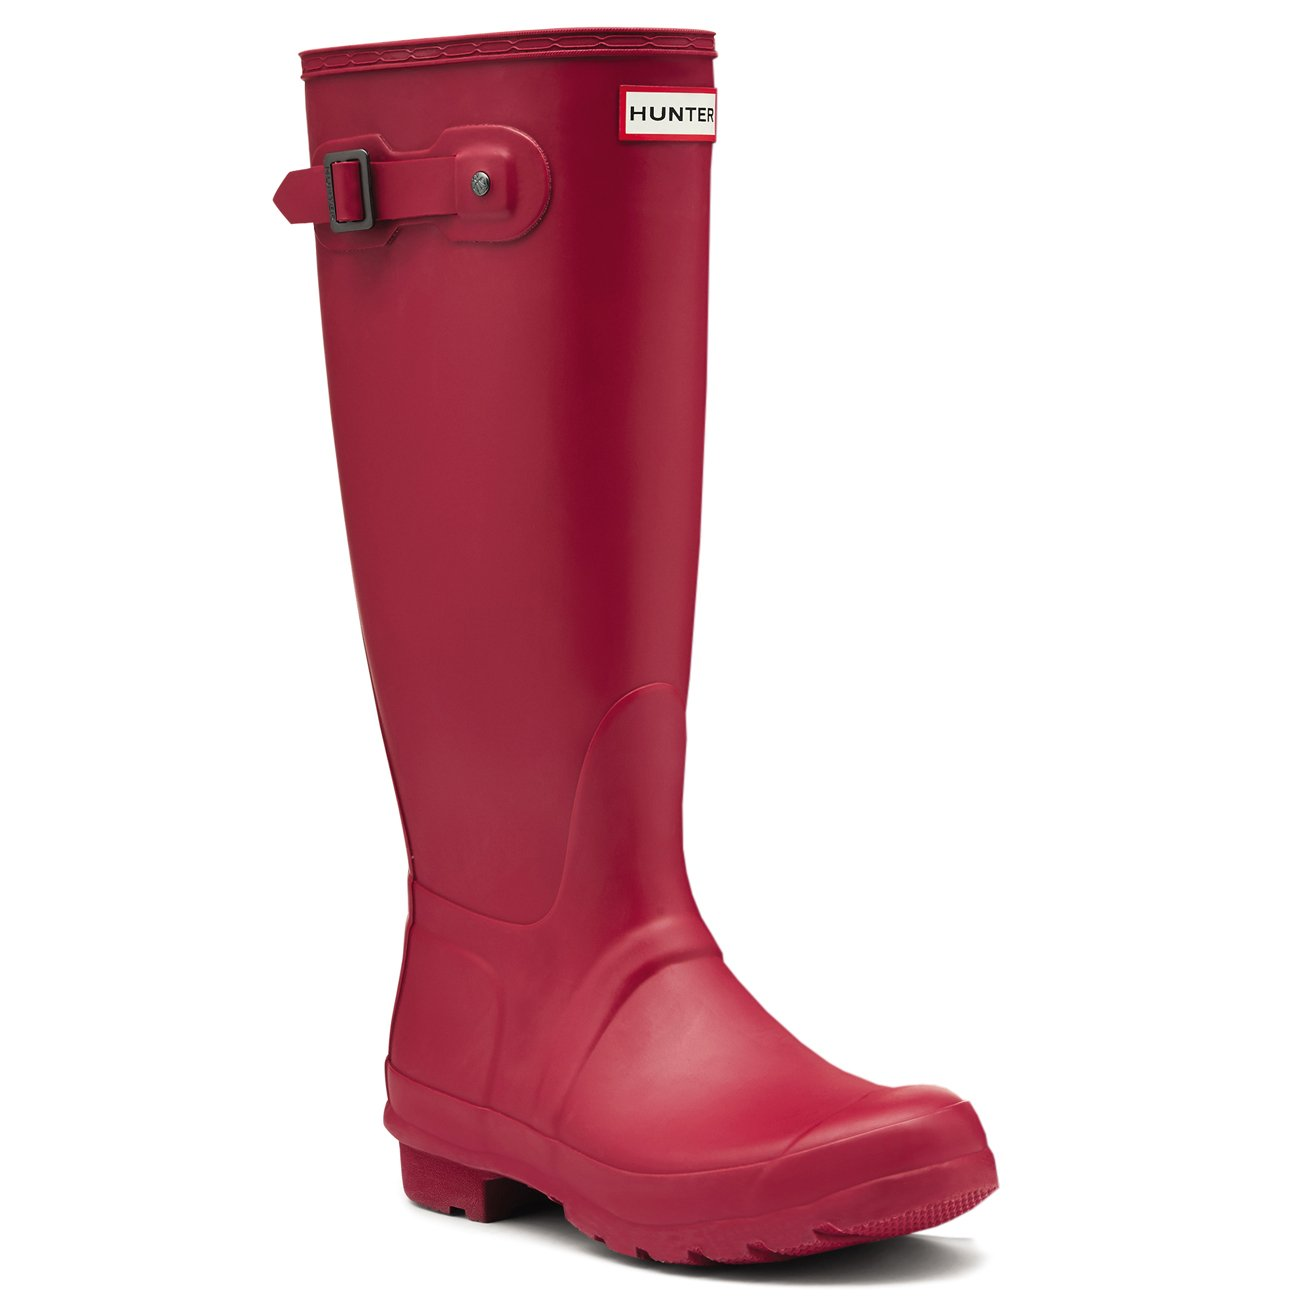 Hunter Womens Original Wide Fit Rainboots Waterproof Snow Wellingtons - Raspberry - 5